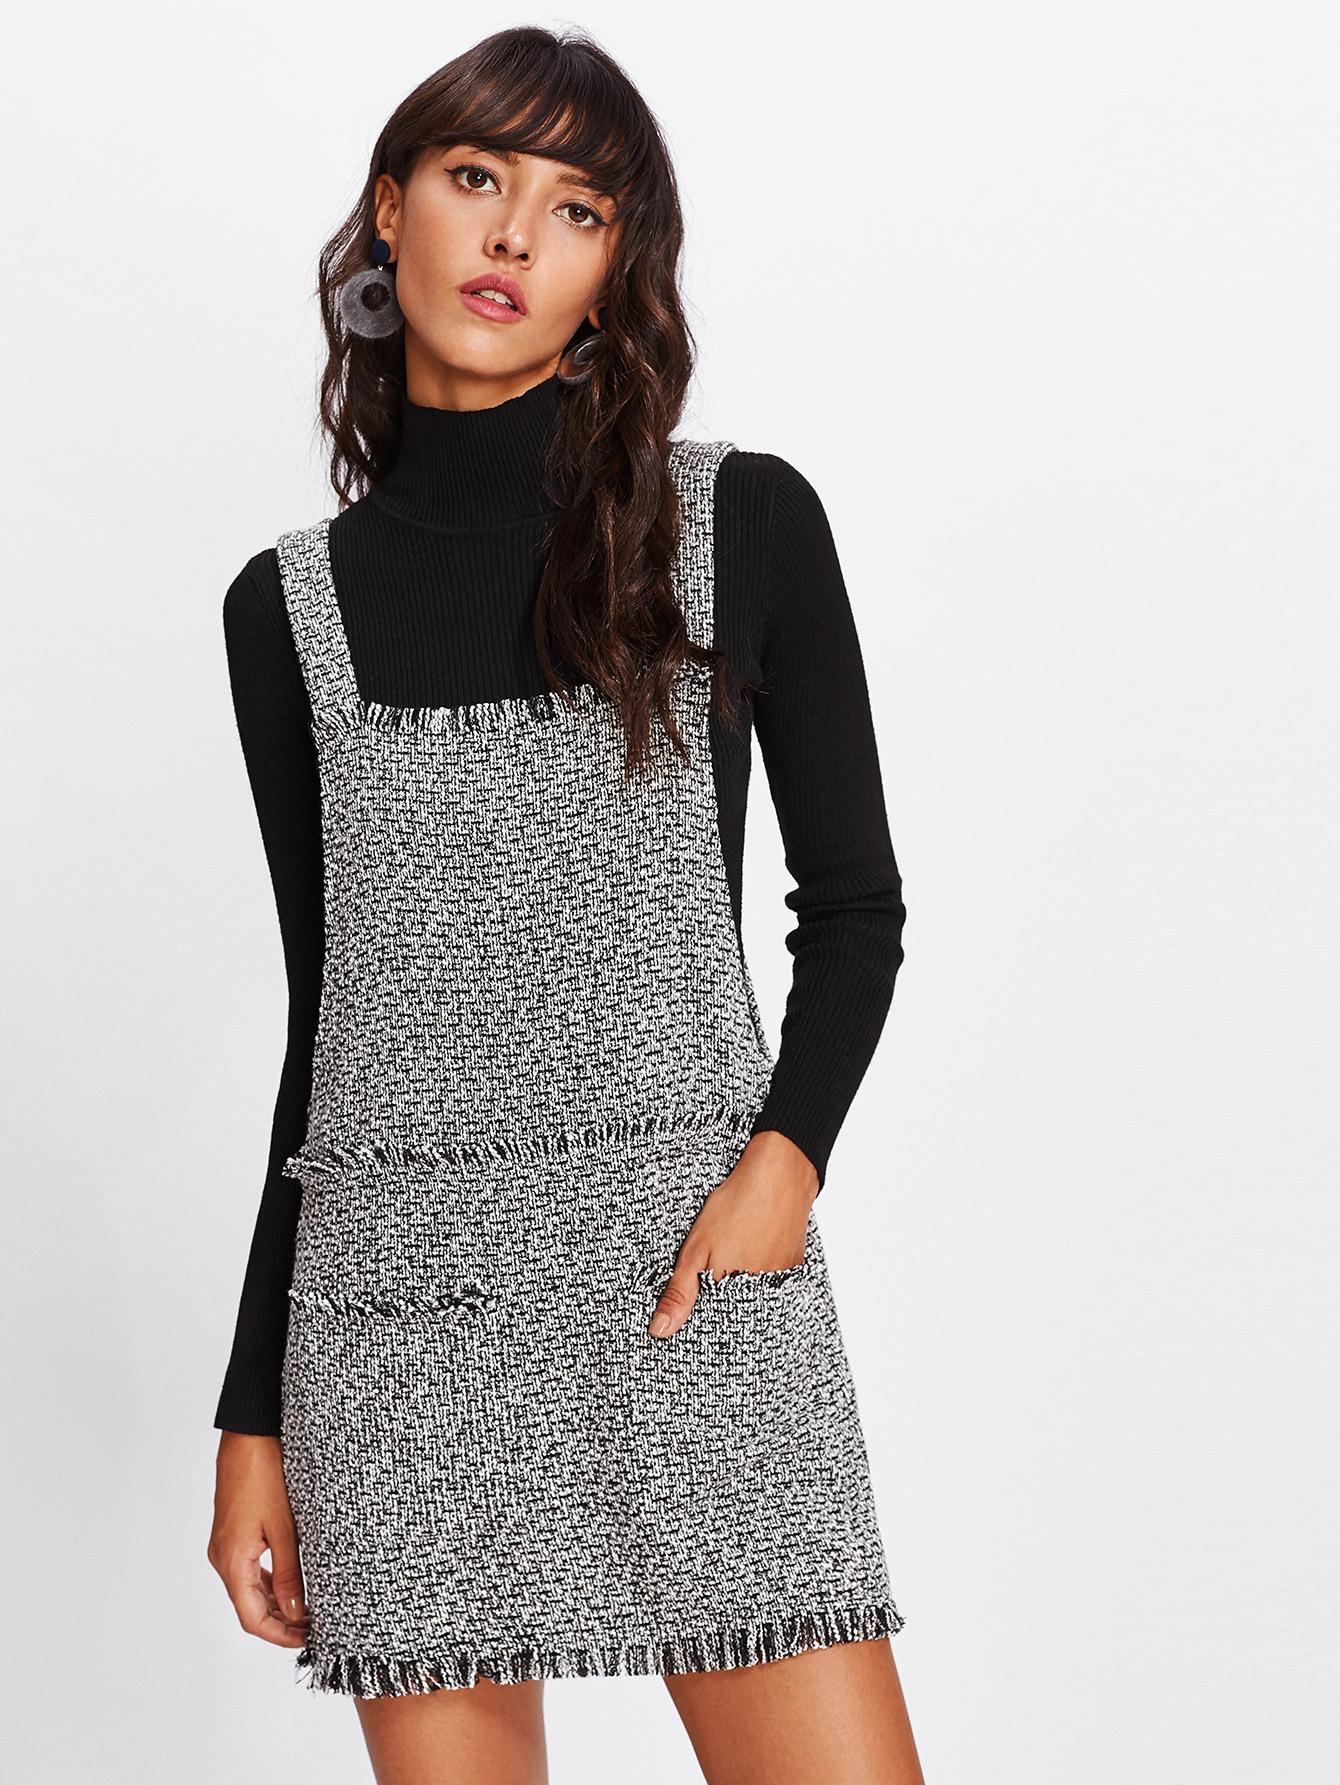 Fringe Detail Tweed Overall Dress lace trim fringe detail tweed top